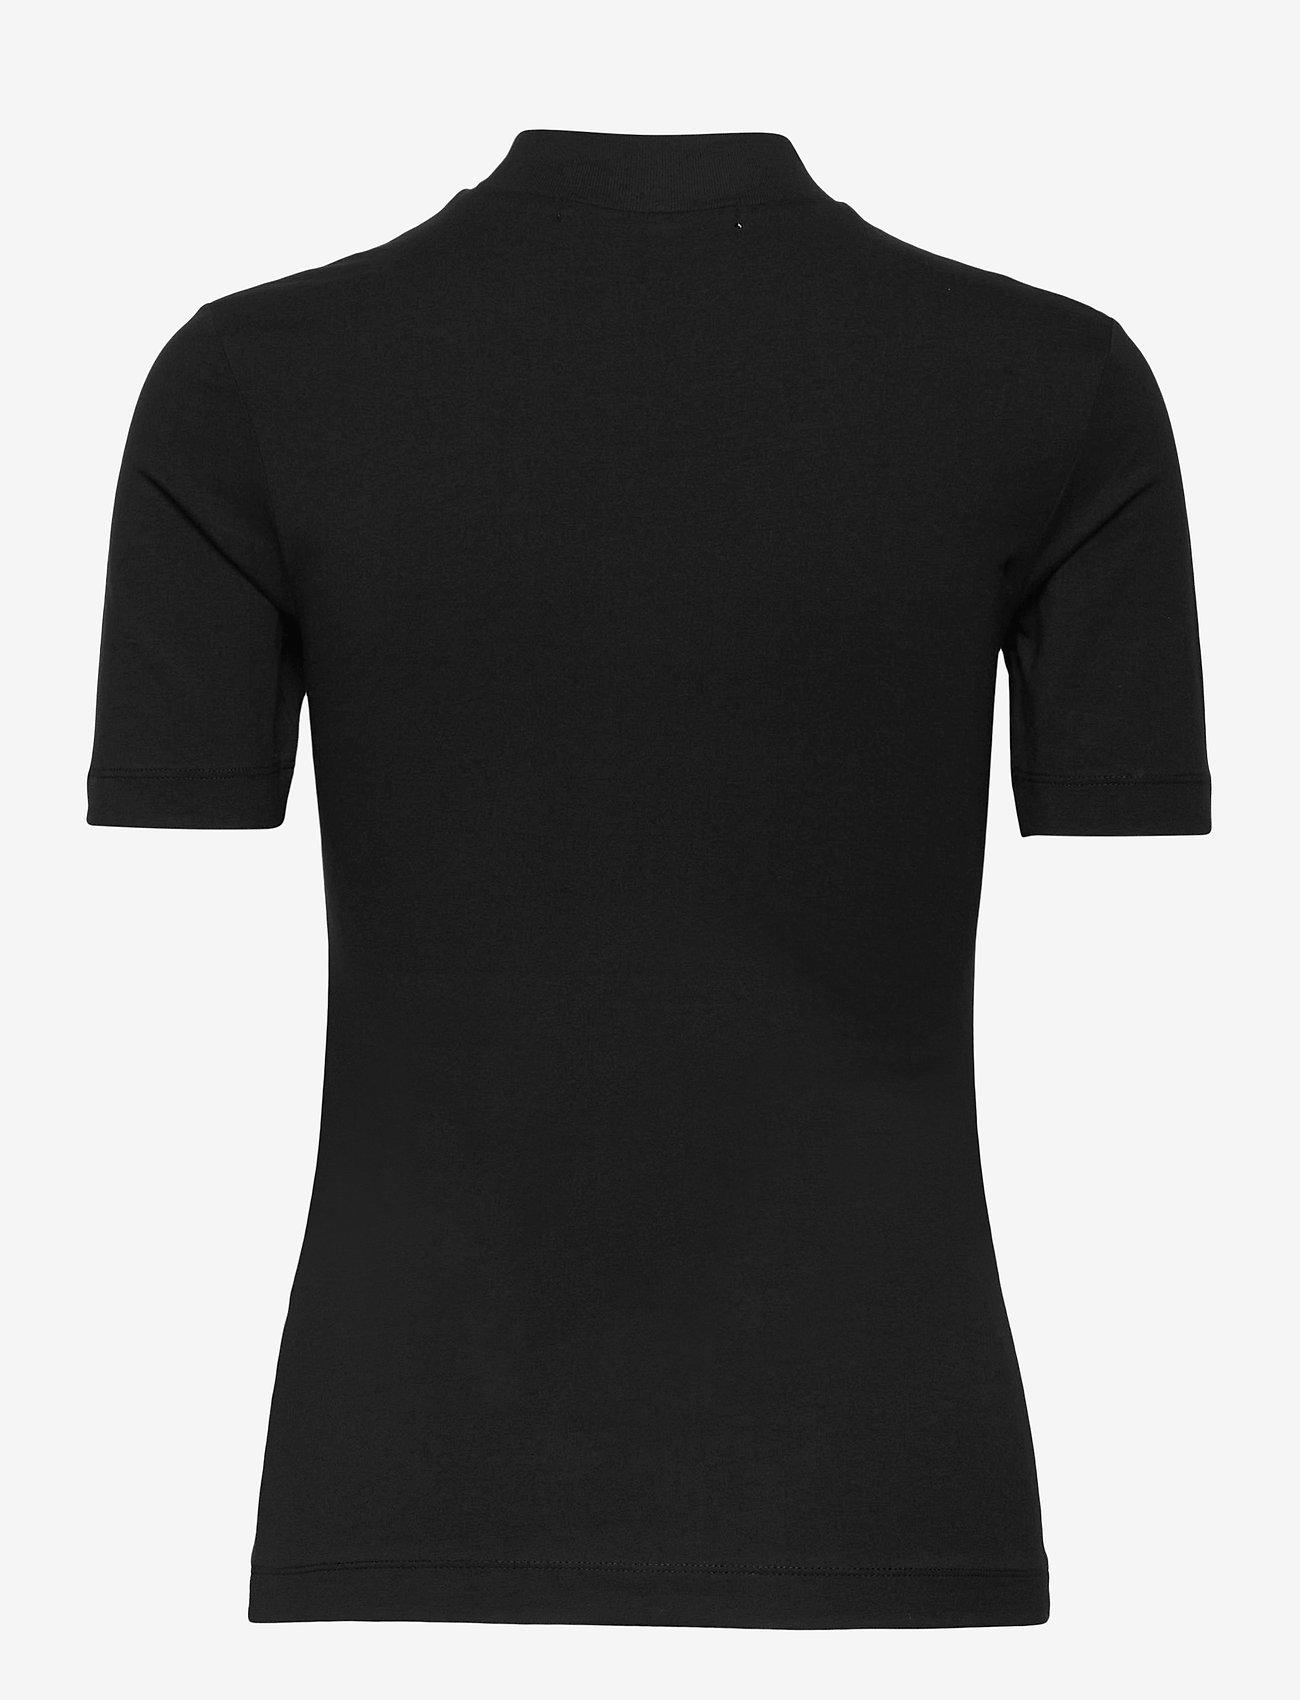 Calvin Klein Jeans - MICRO BRANDING STRETCH MOCK NECK - t-shirts - ck black - 1